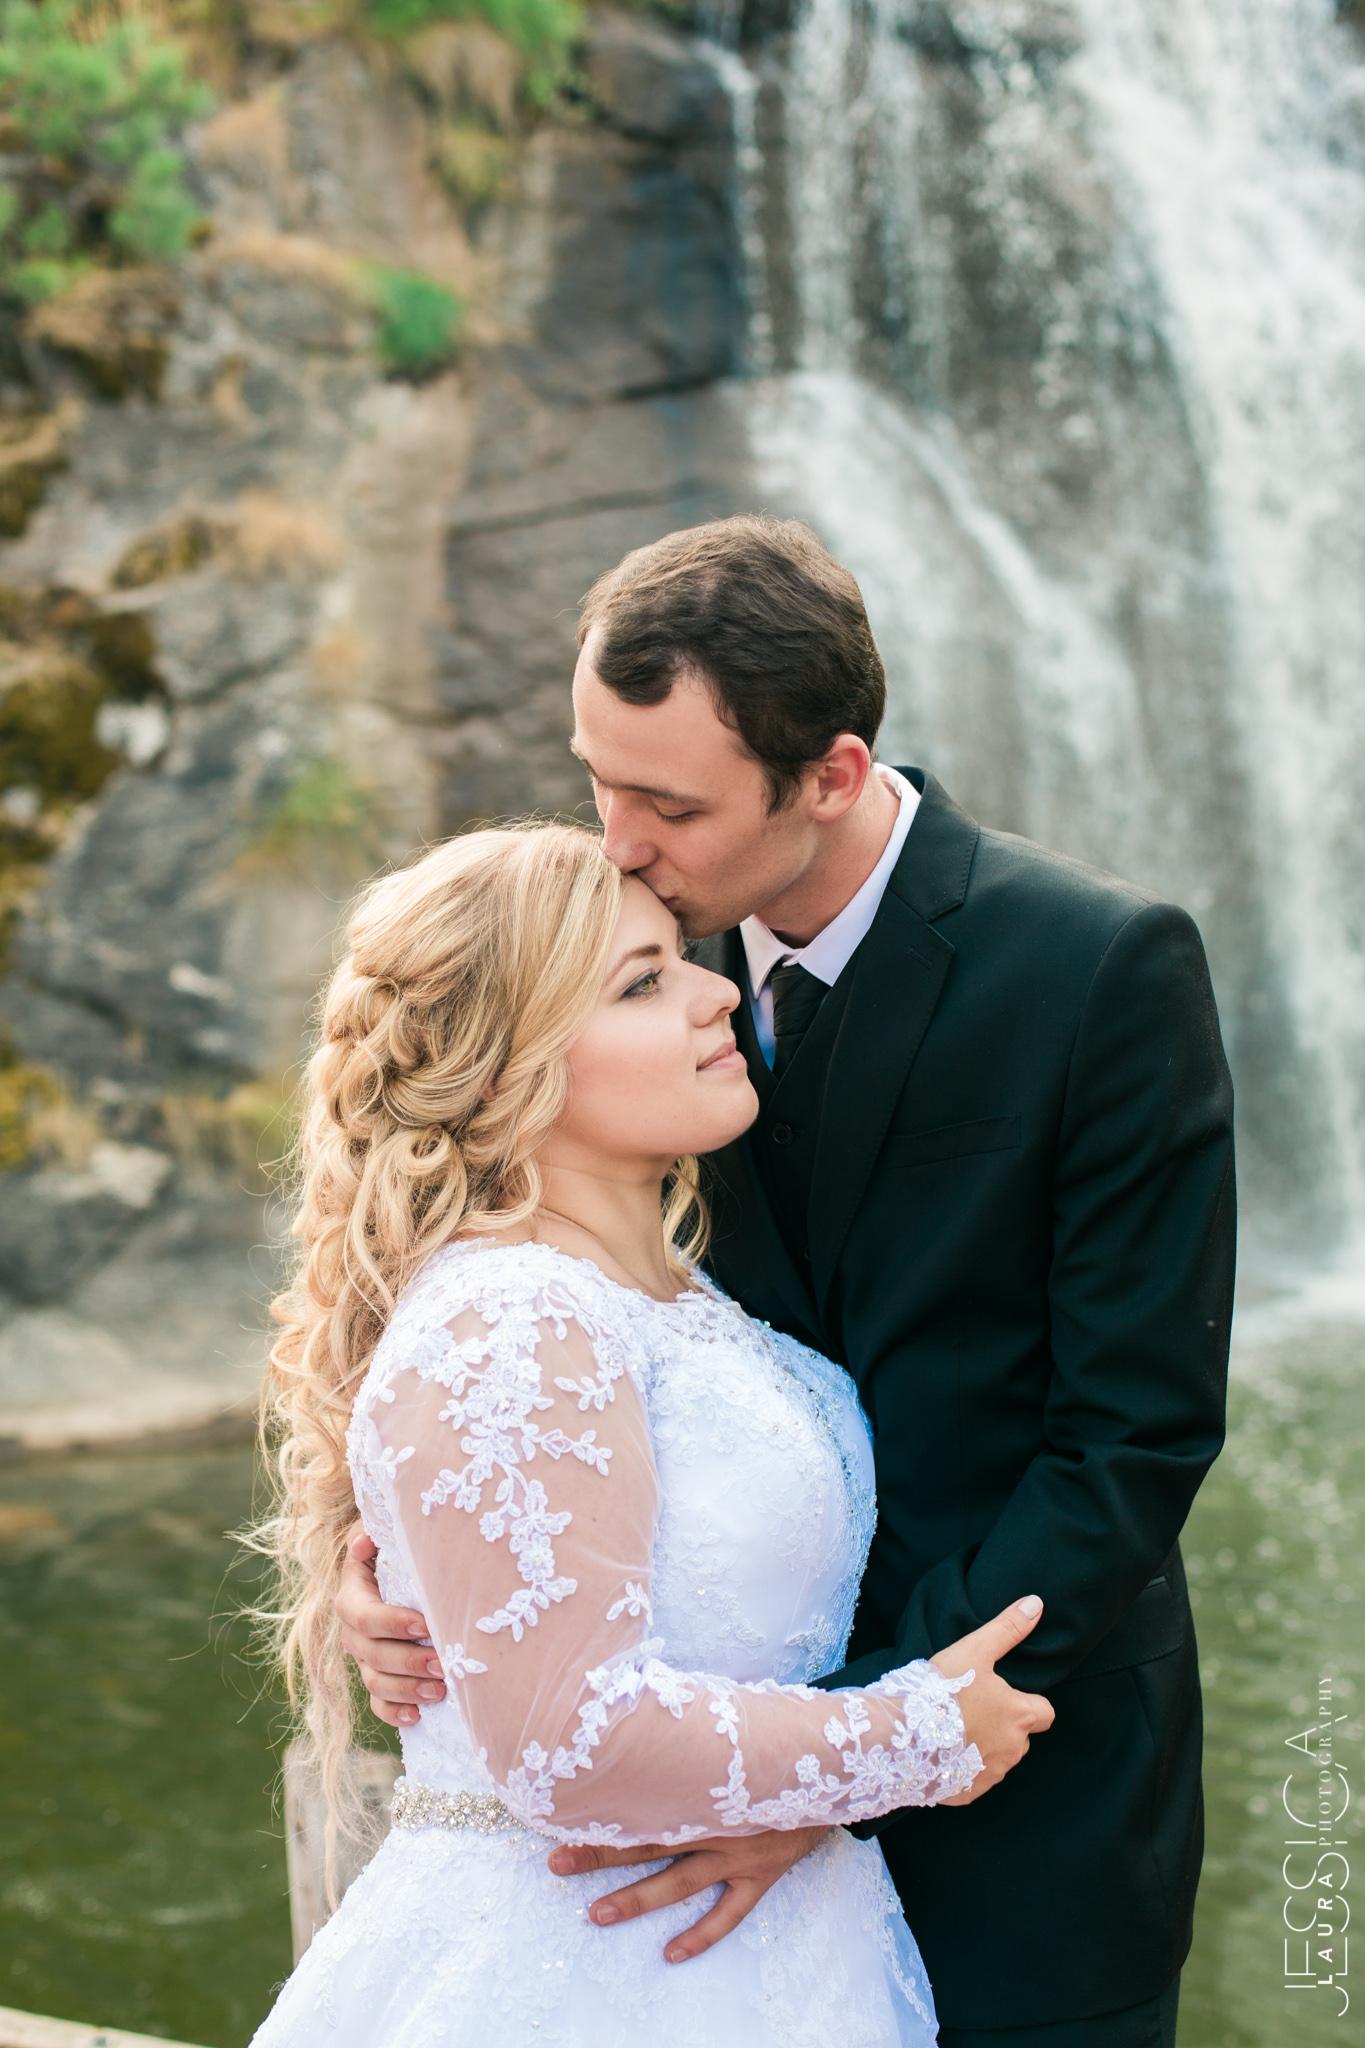 Eugene-Maryana_wedding_08062017_web (538 of 558).JPG